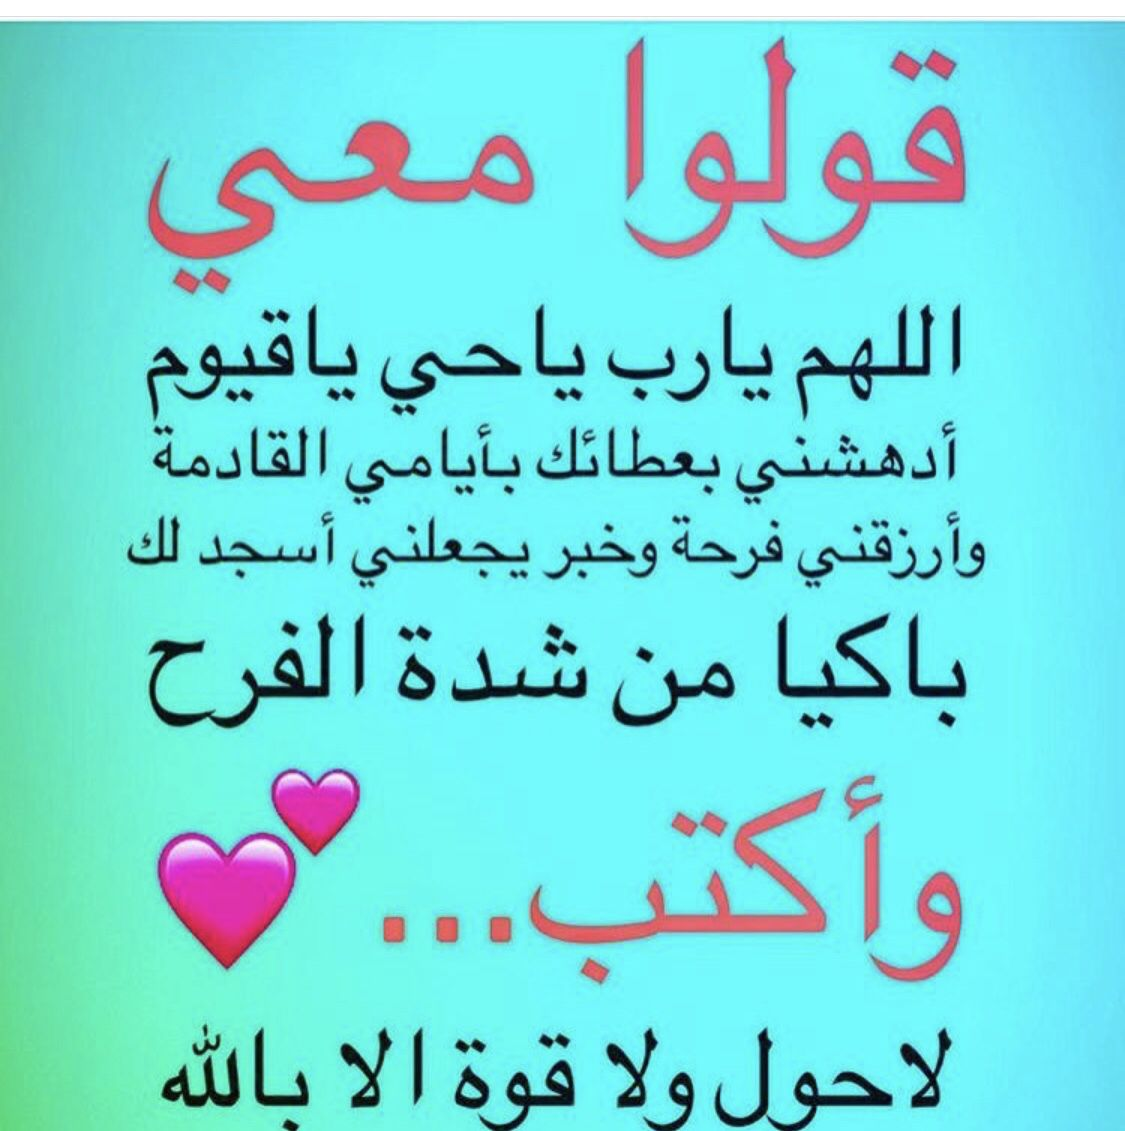 Pin By Rosalinda On ادعية دينية Islamic Quotes Quotations Quotes